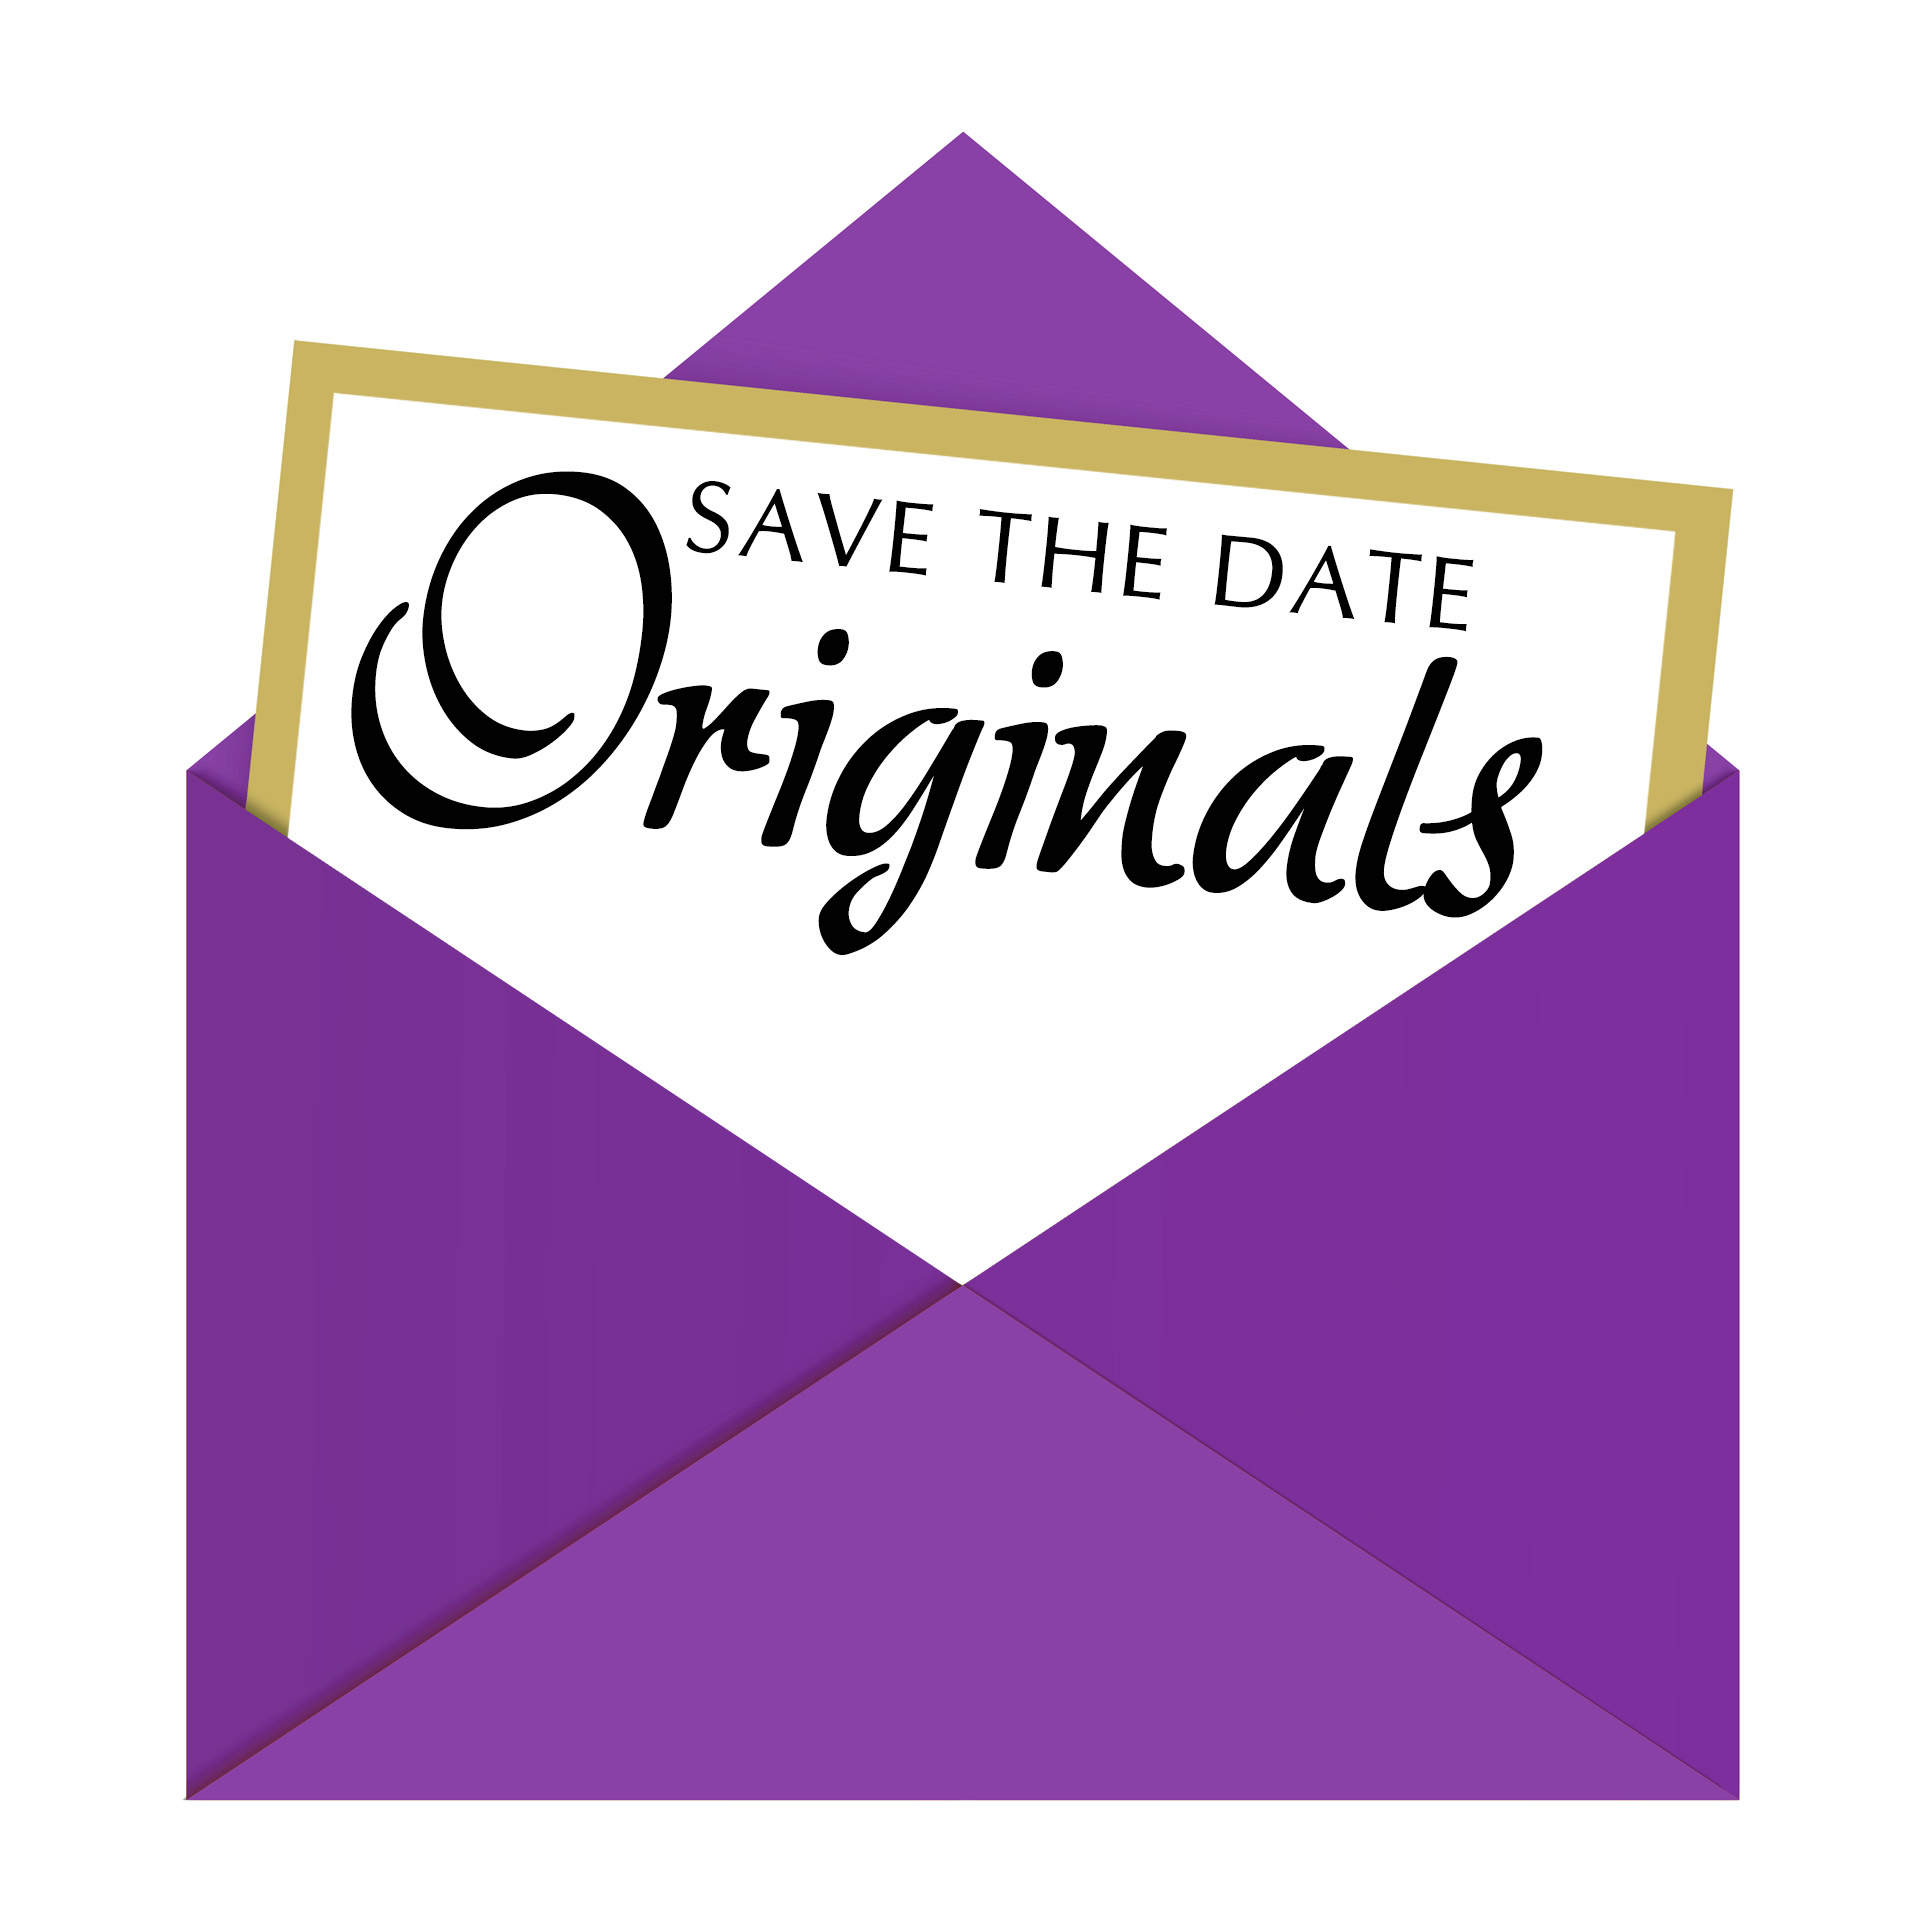 1924x1924 Save The Date Originals